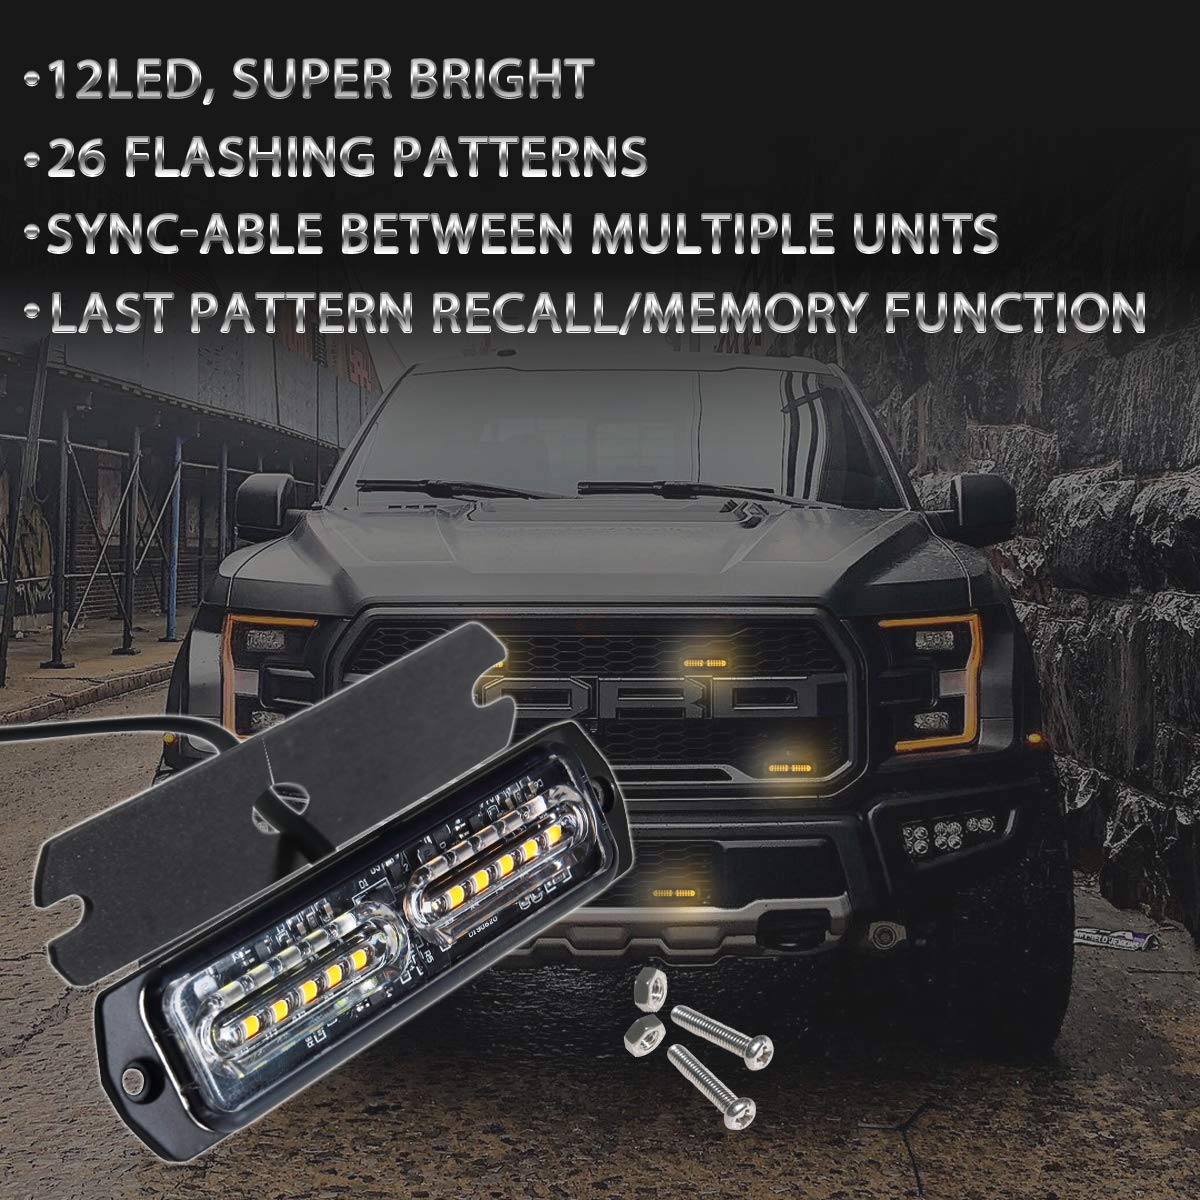 Amber//White ASPL 4pcs Sync Feature 12-LED Surface Mount Flashing Strobe Lights for Truck Car Vehicle LED Mini Grille Light Head Emergency Beacon Hazard Warning lights